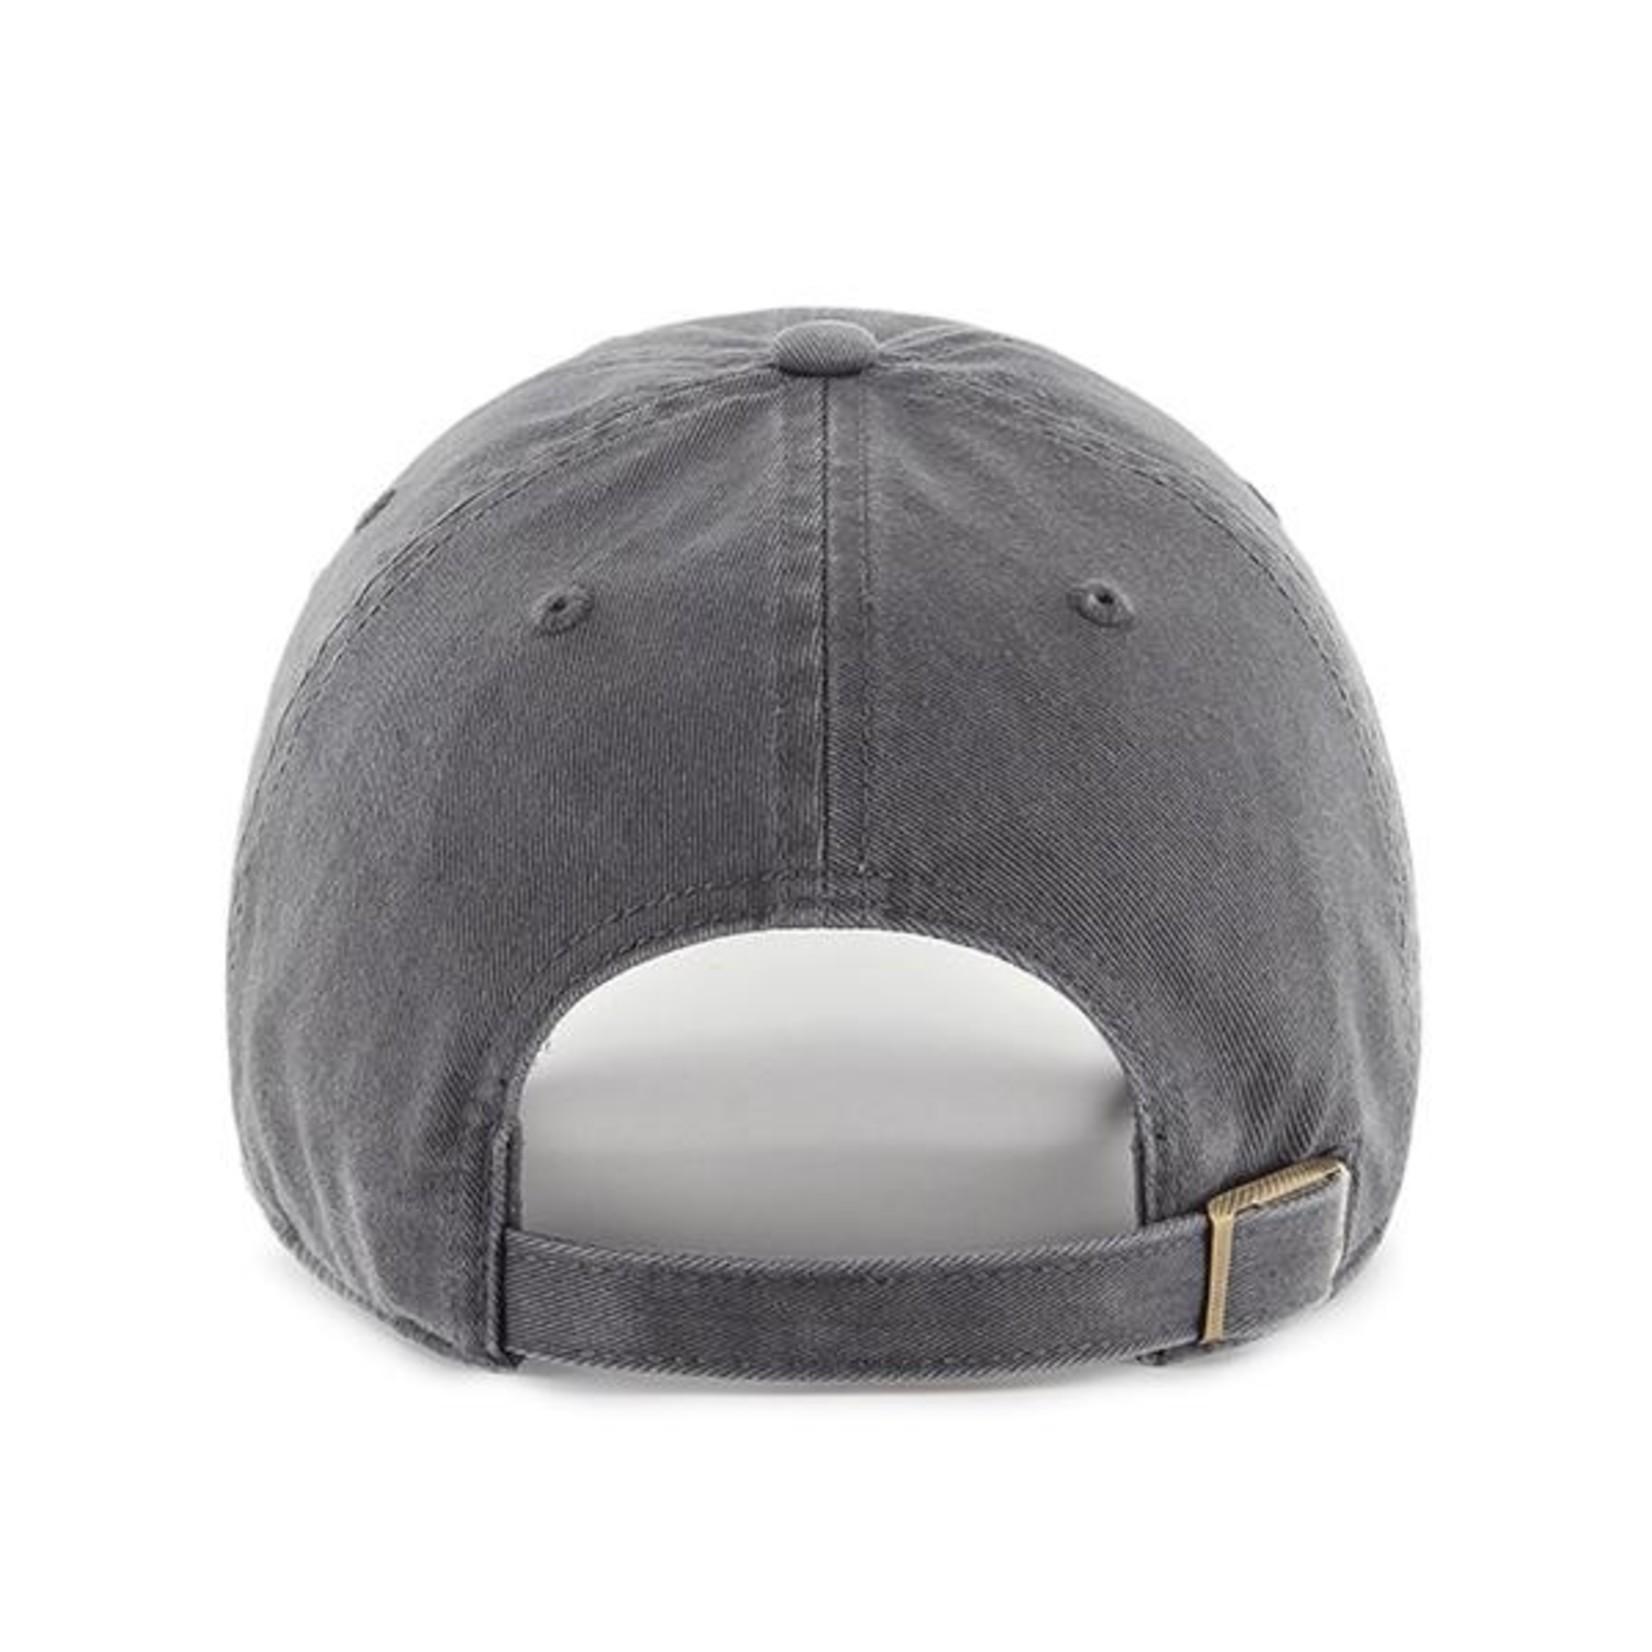 47 Brand Classic Clean Up Baseball Cap - Charcoal